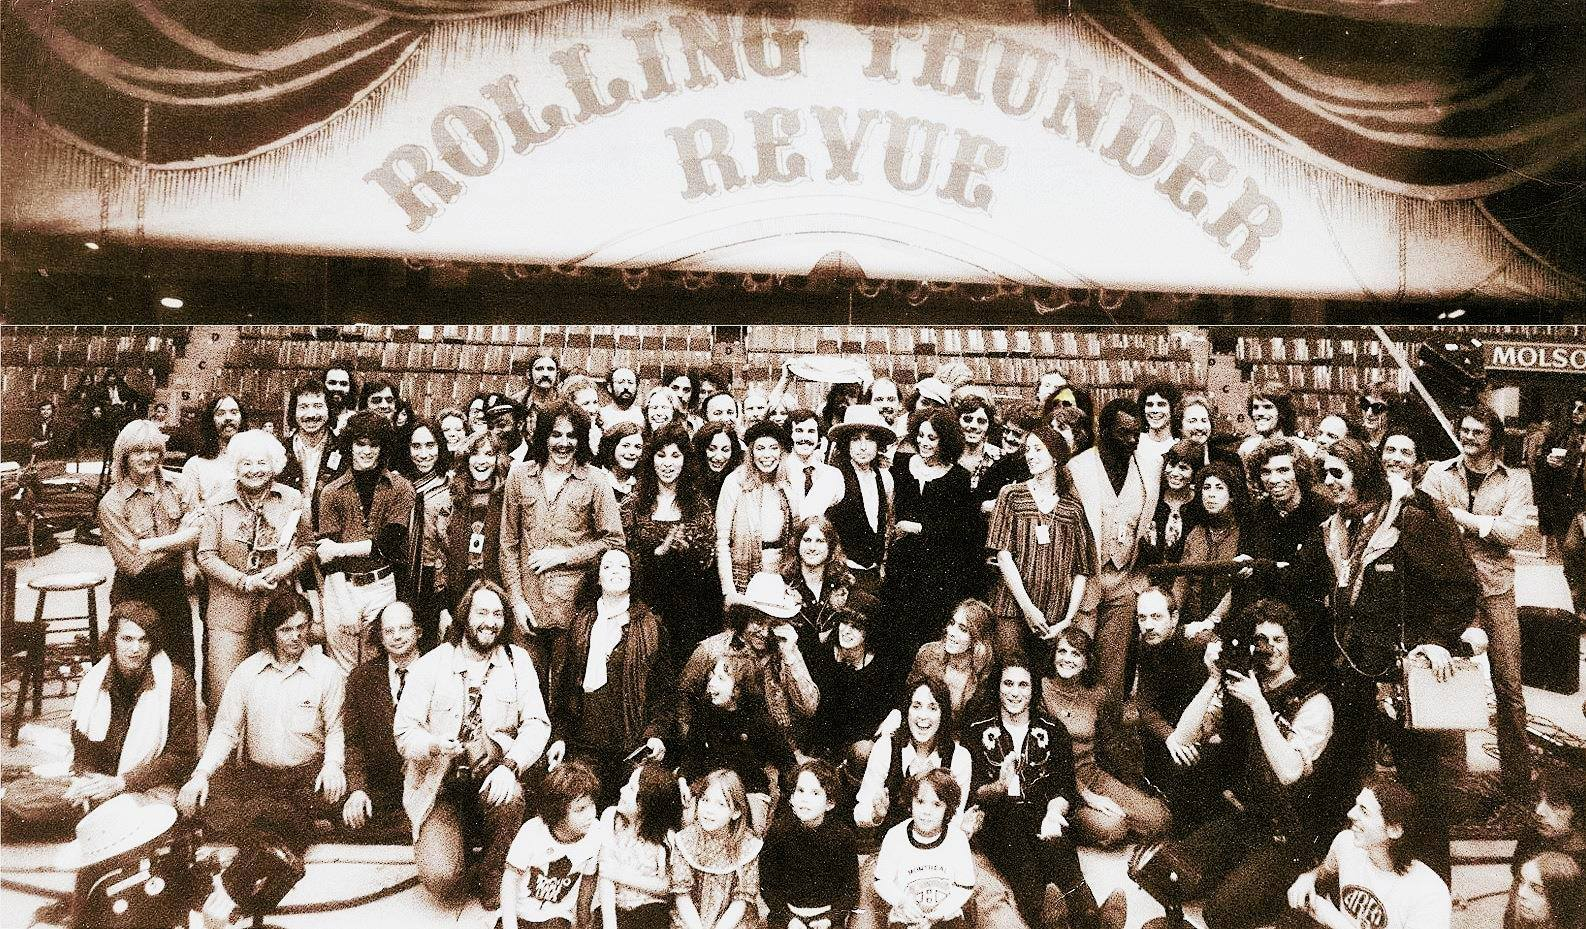 rolling_thunder_revenue_bob_dylan